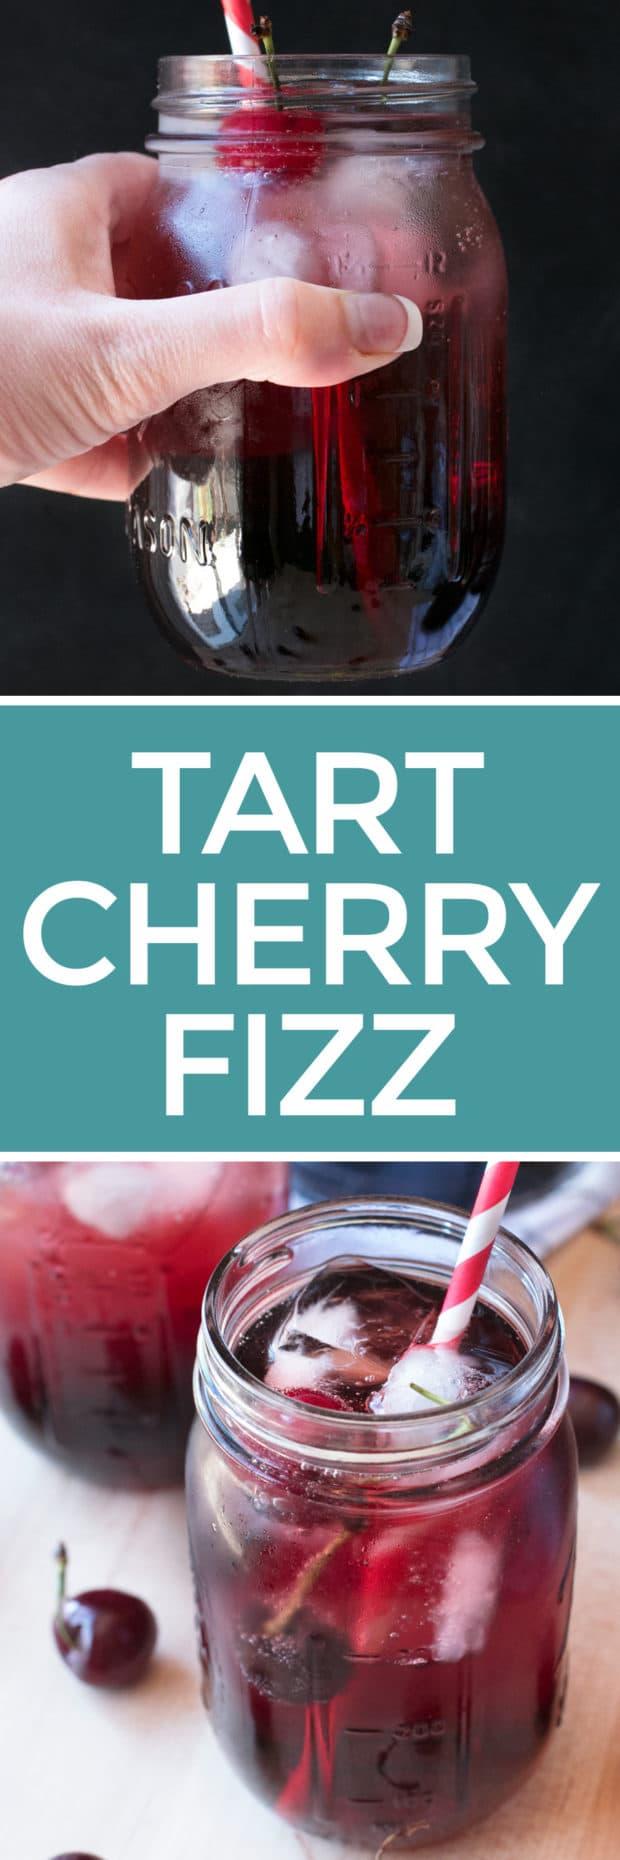 Tart Cherry Fizz   cakenknife.com #cocktail #happyhour